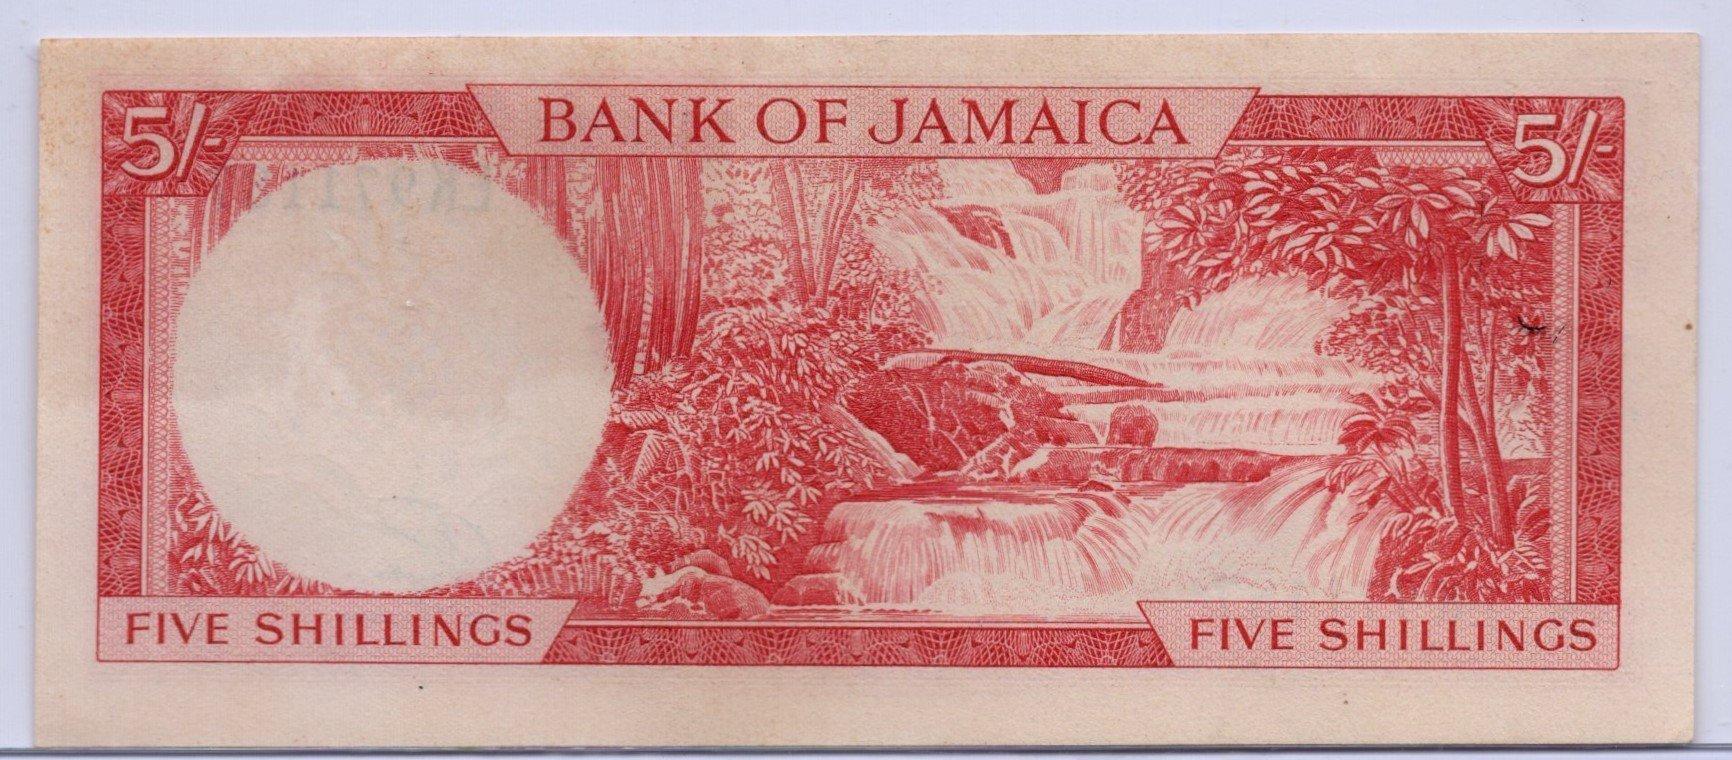 Jamaica 5 shillings back